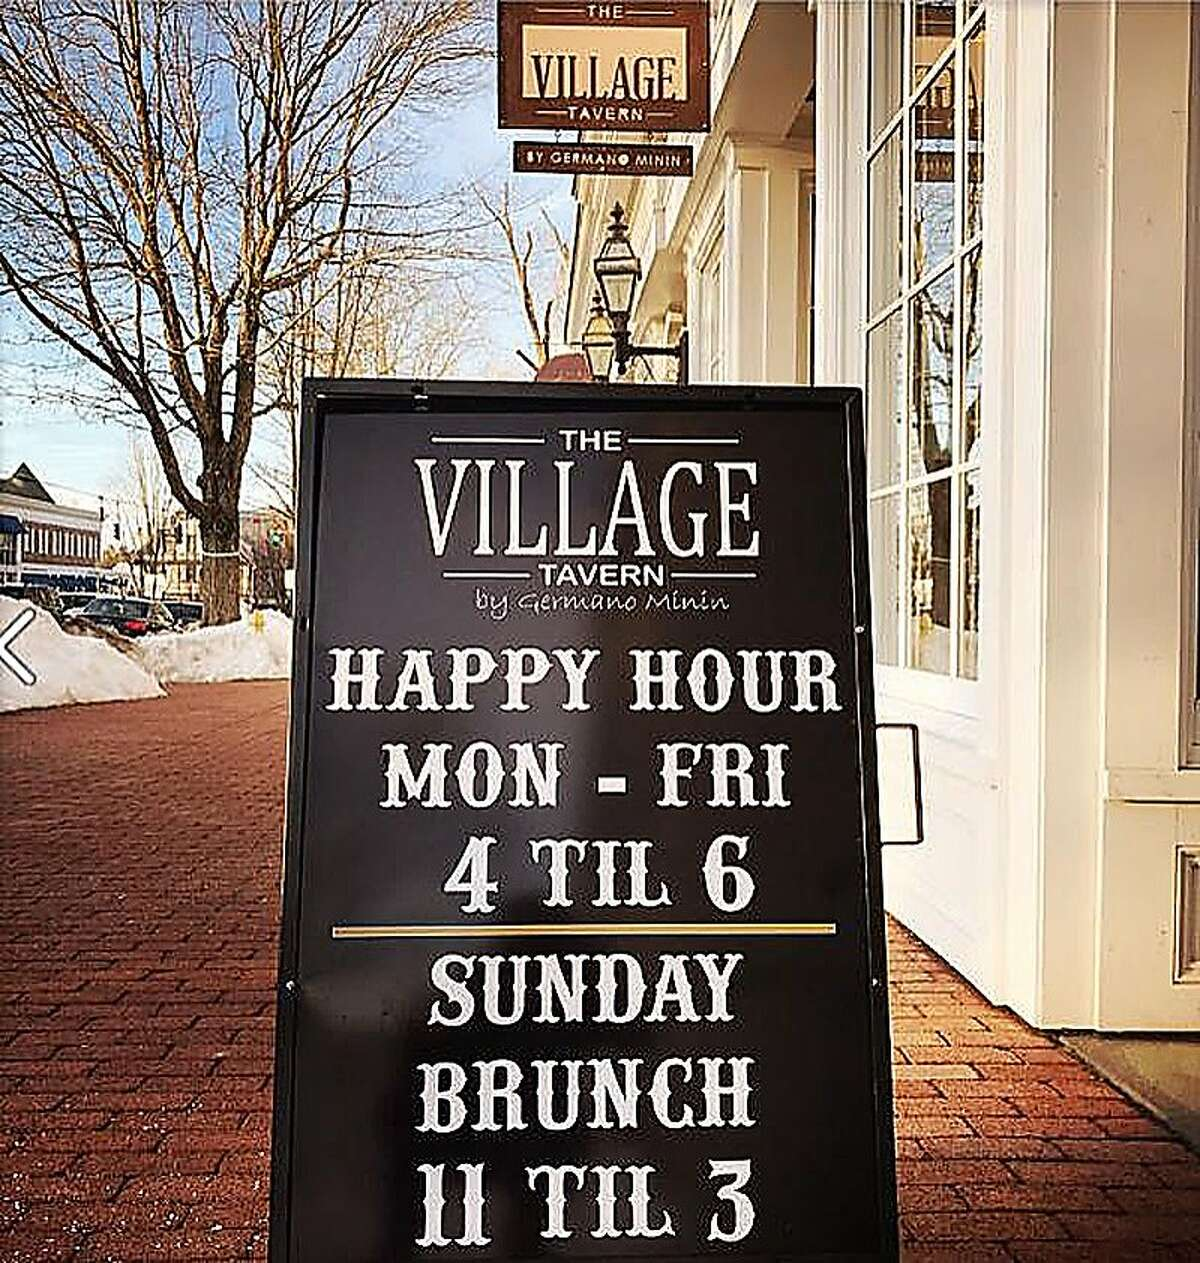 The Village Tavern on Main Street in Ridgefield, Conn.